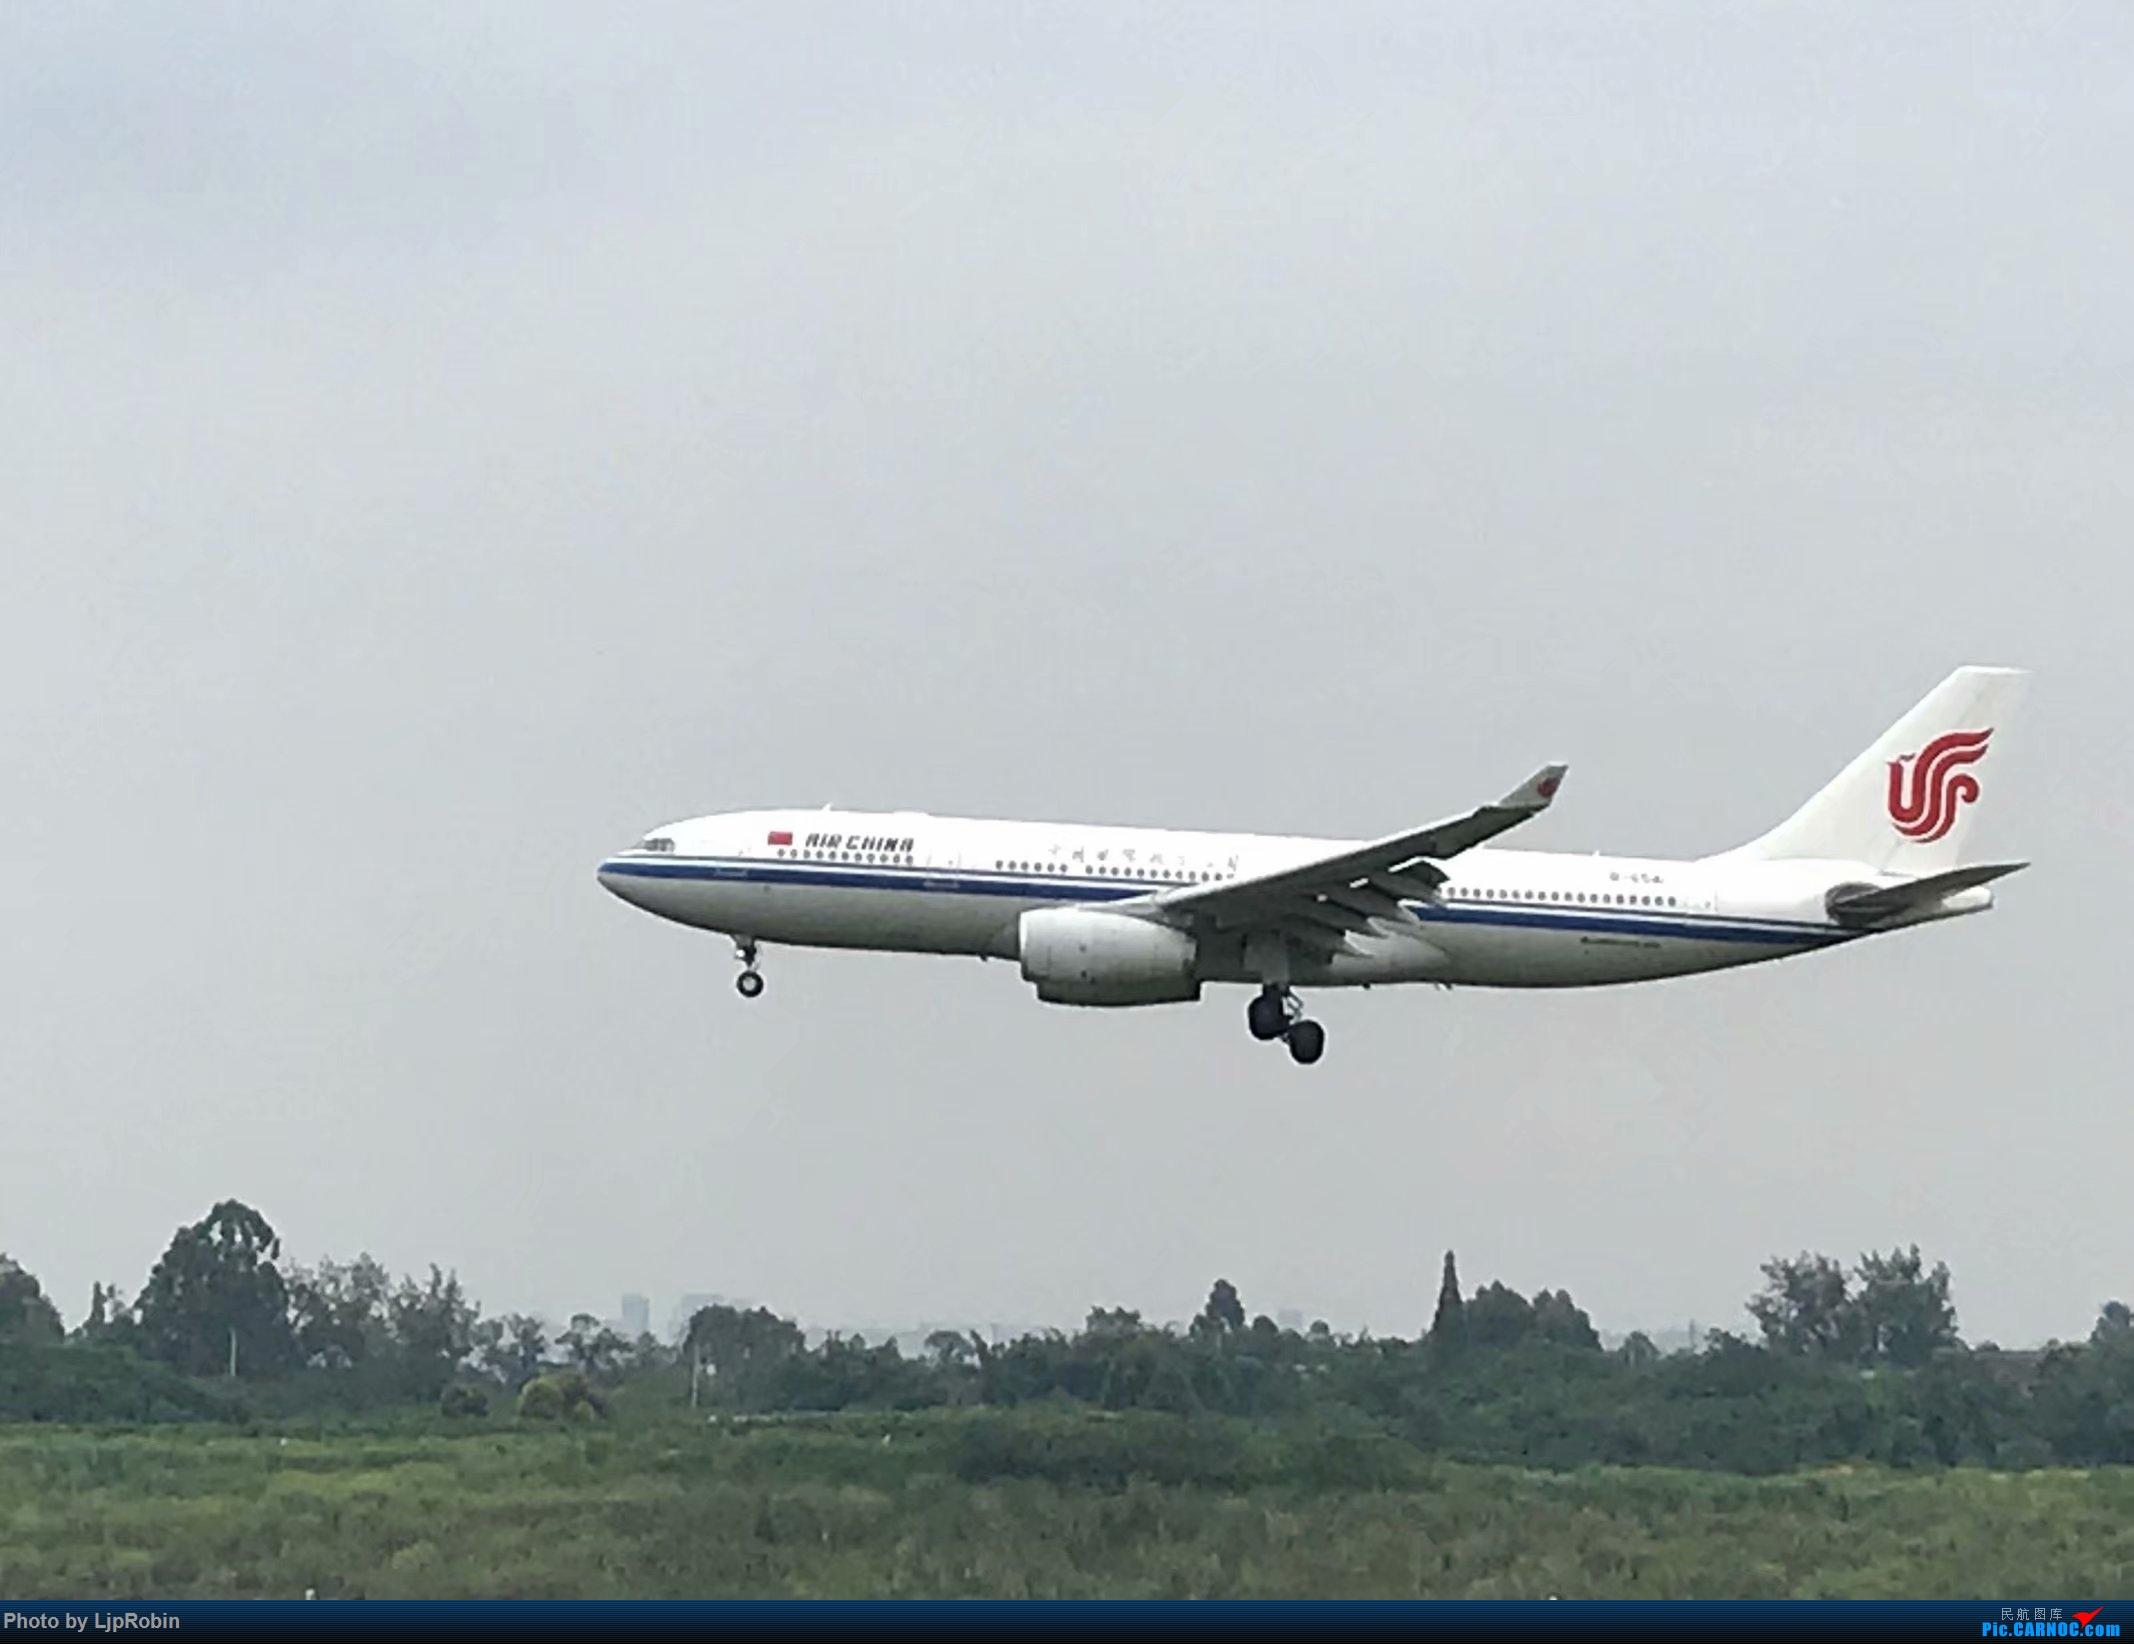 Re:[原创]CTU拍机,新人首发。希望各位大佬多多支持 AIRBUS A330-200  双流机场T2观景台